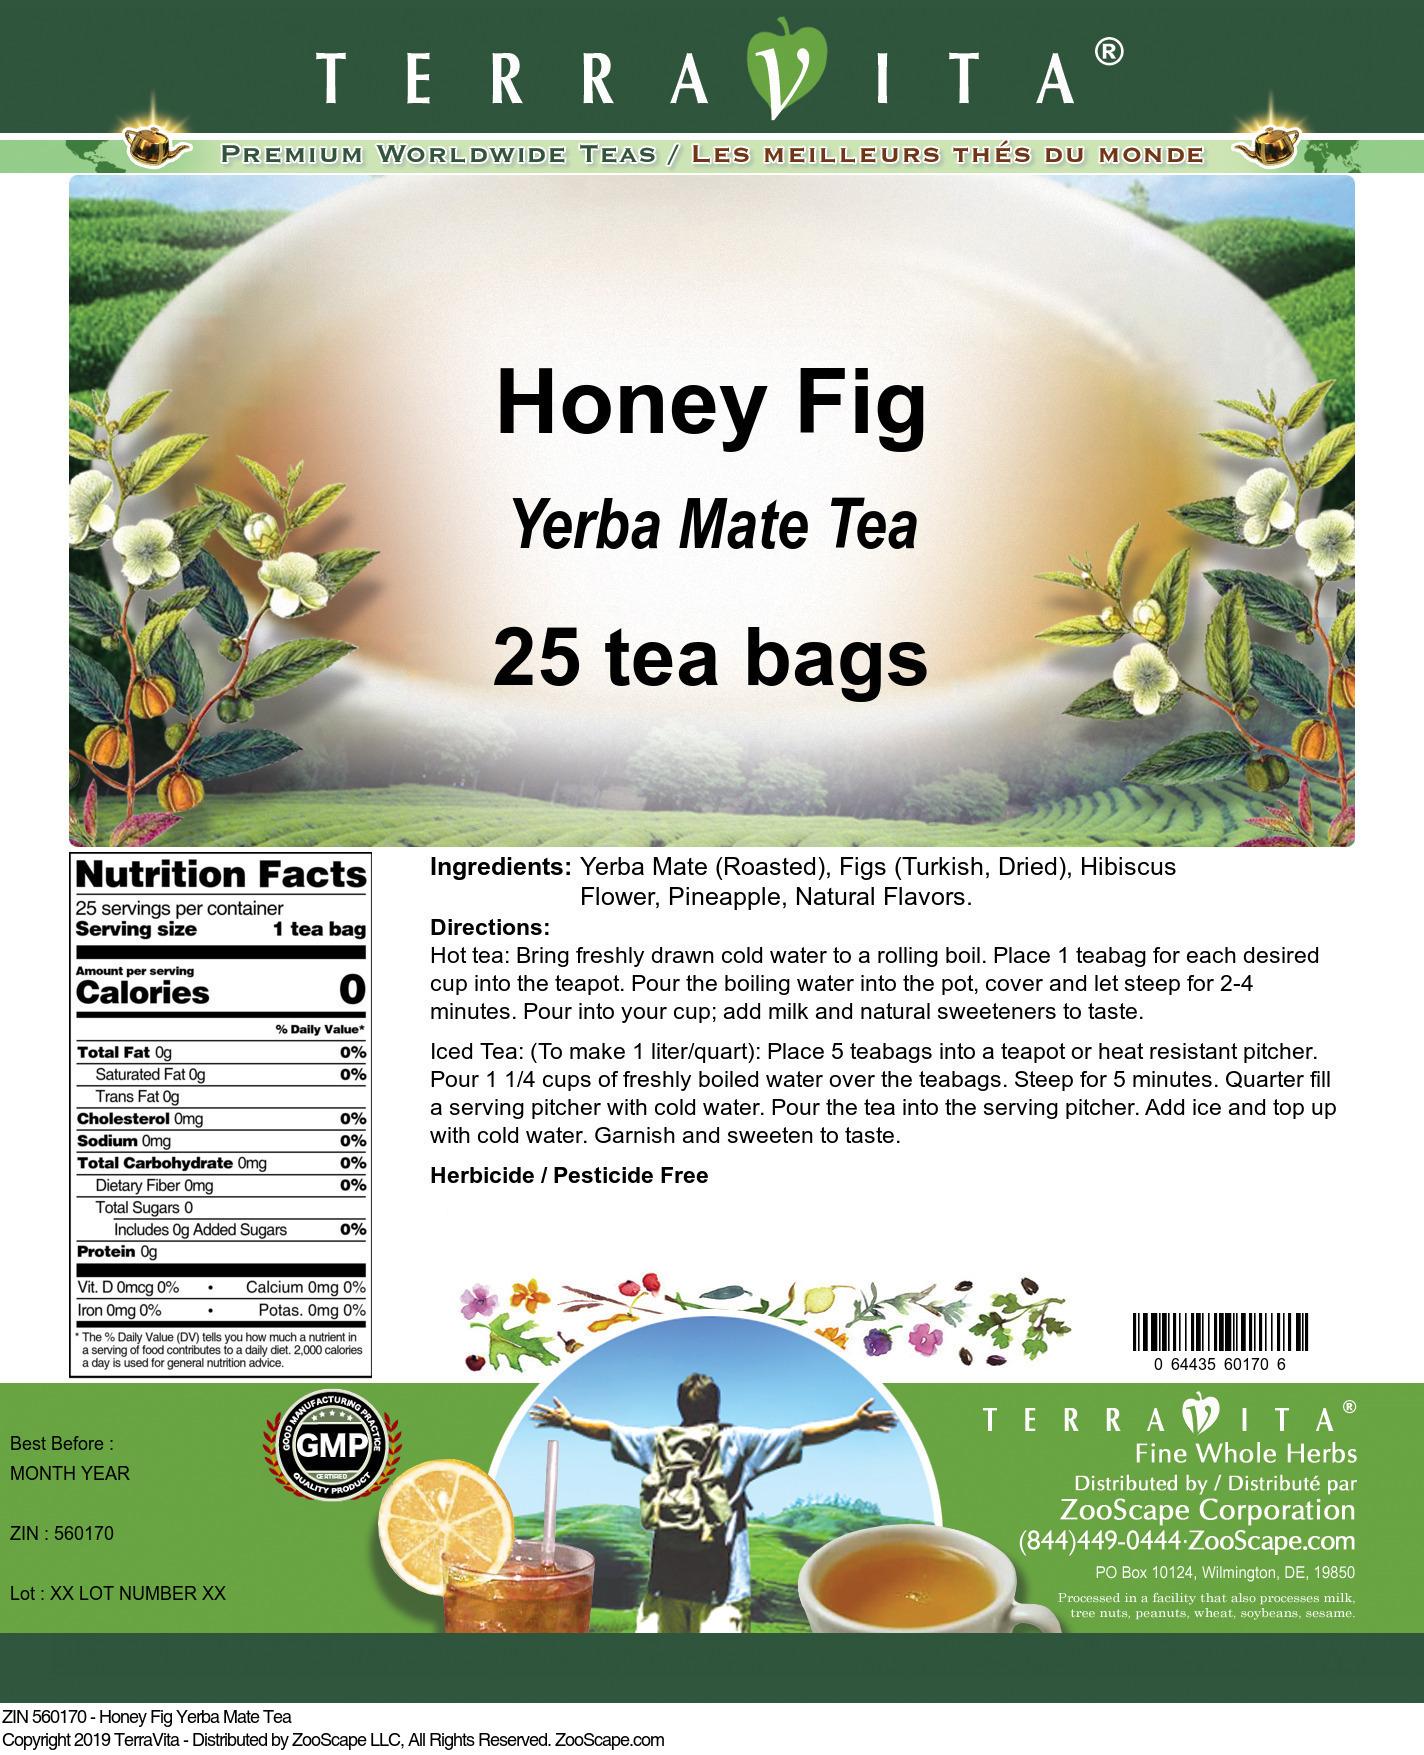 Honey Fig Yerba Mate Tea